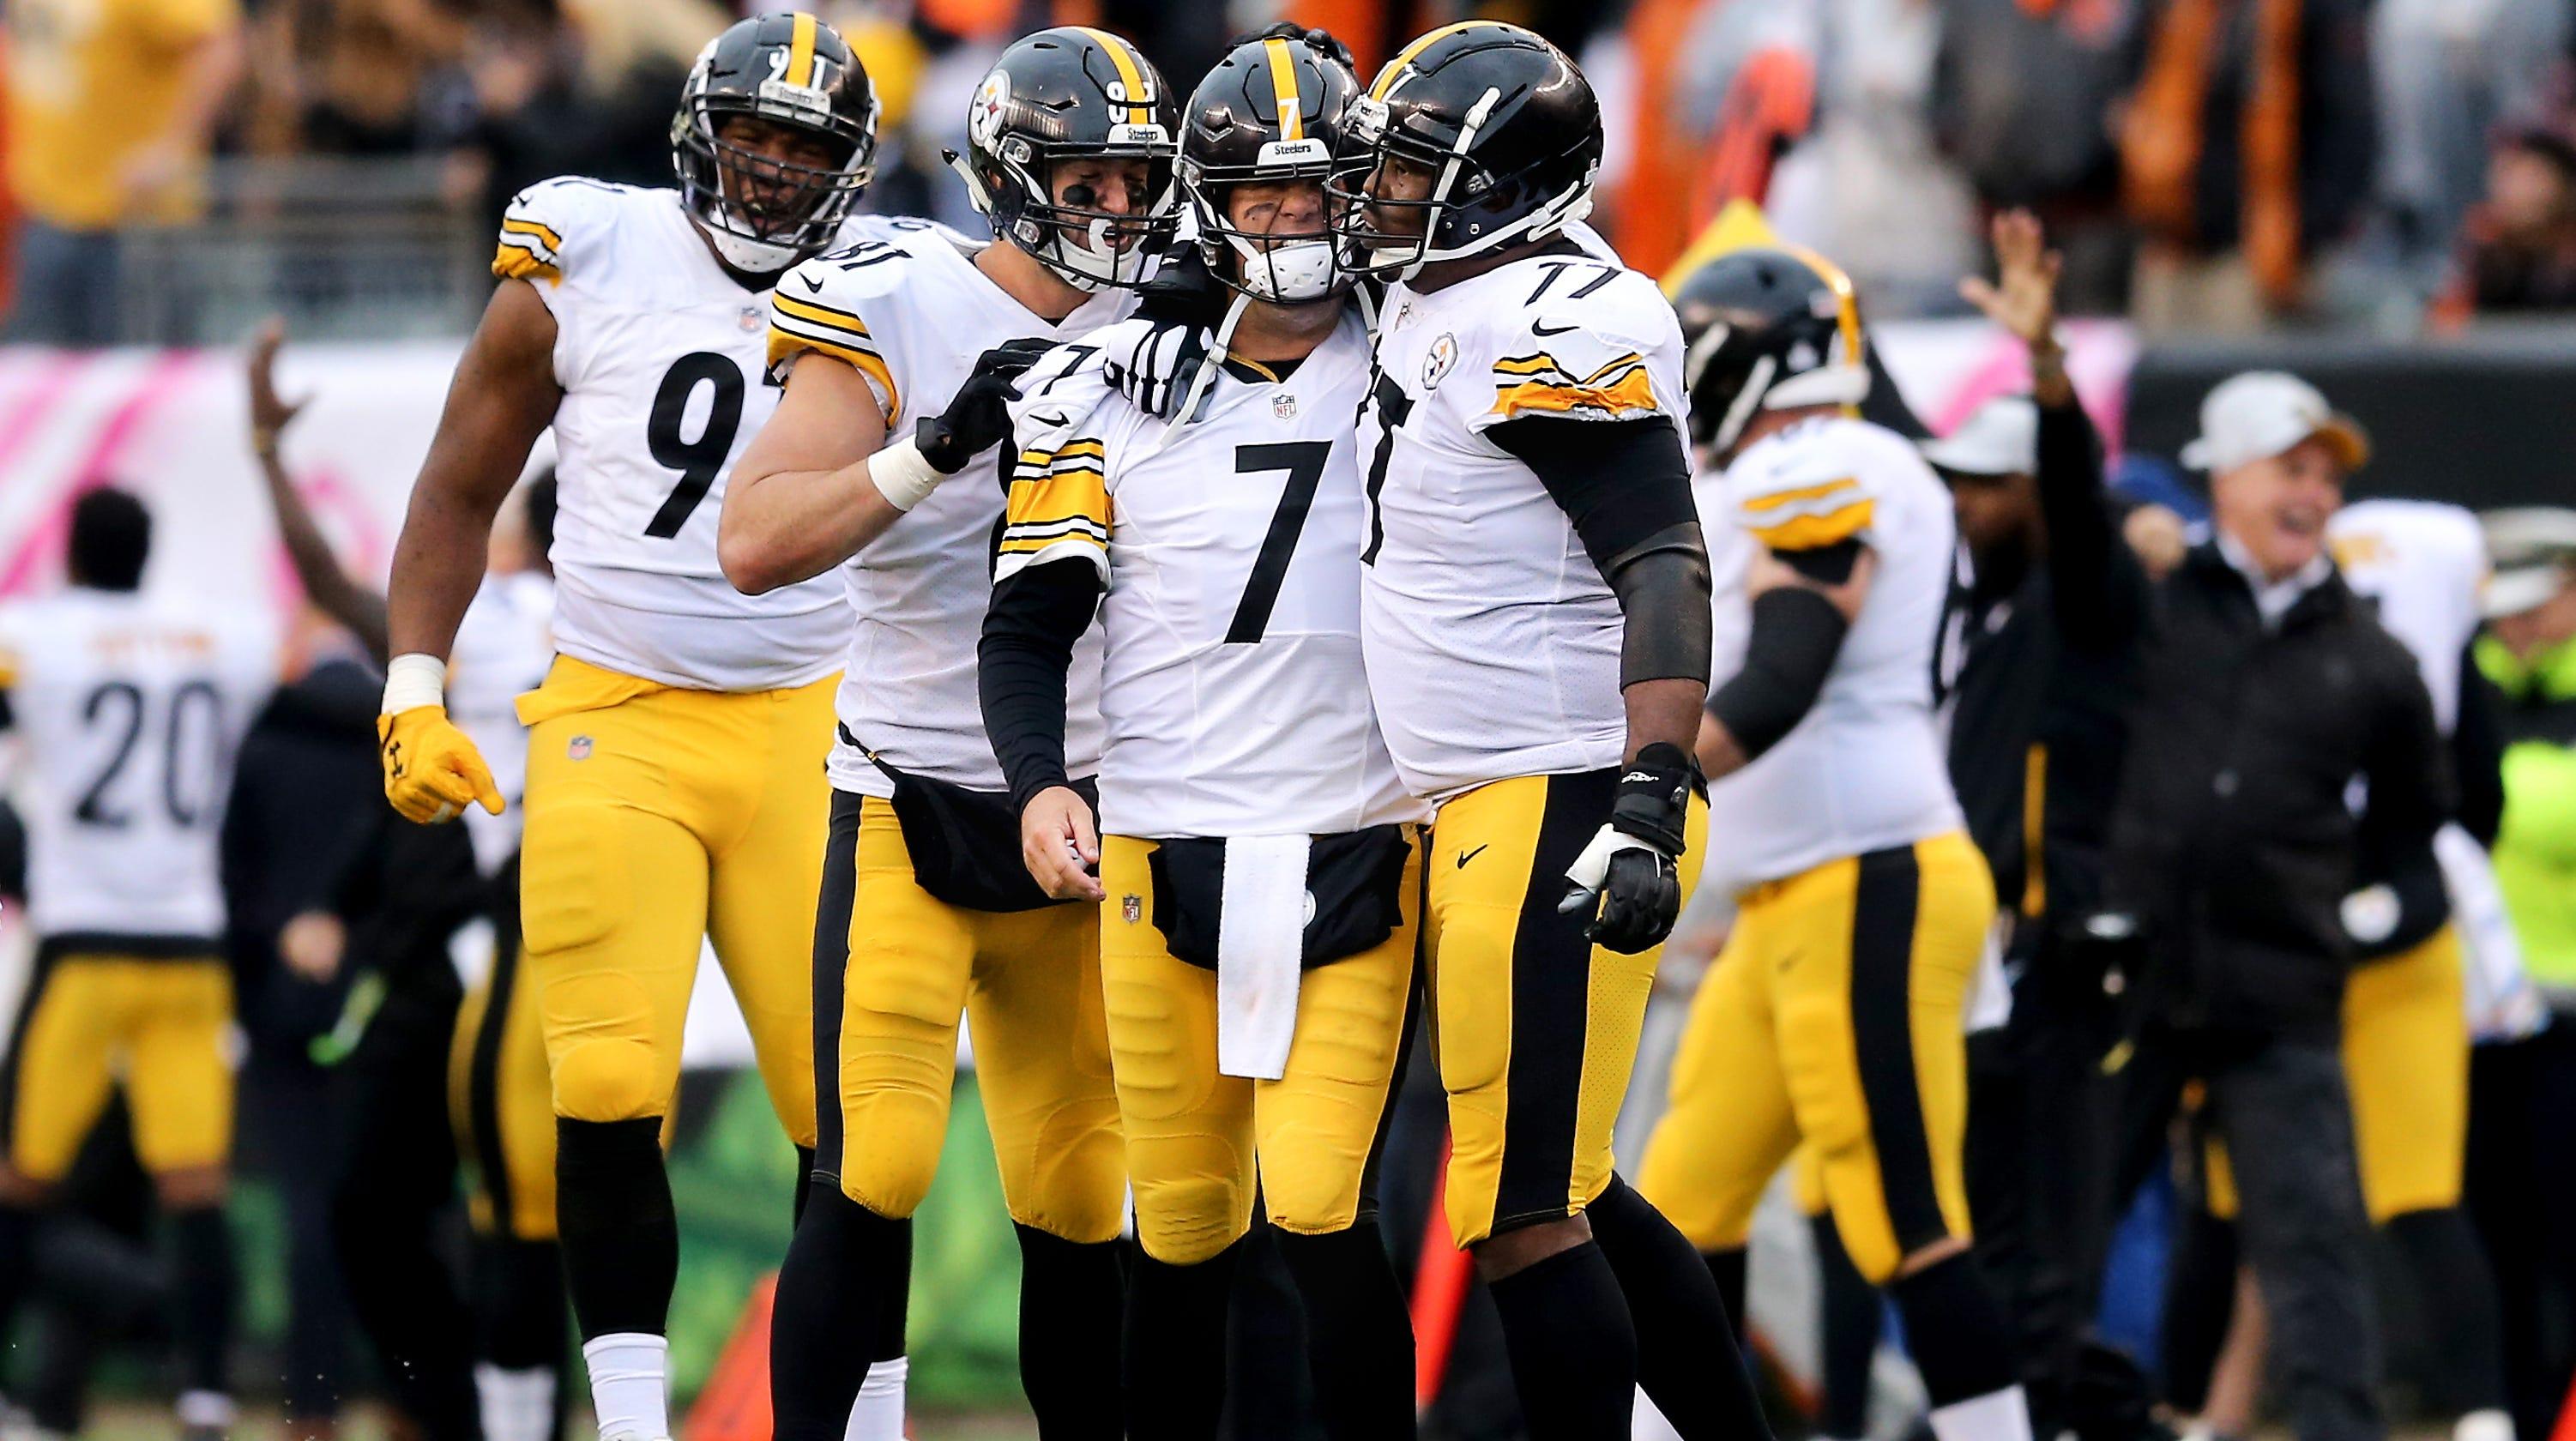 b755027ac Paul Daugherty: Ben Roethlisberger, Pittsburgh Steelers did what they do  best – beat the Cincinnati Bengals